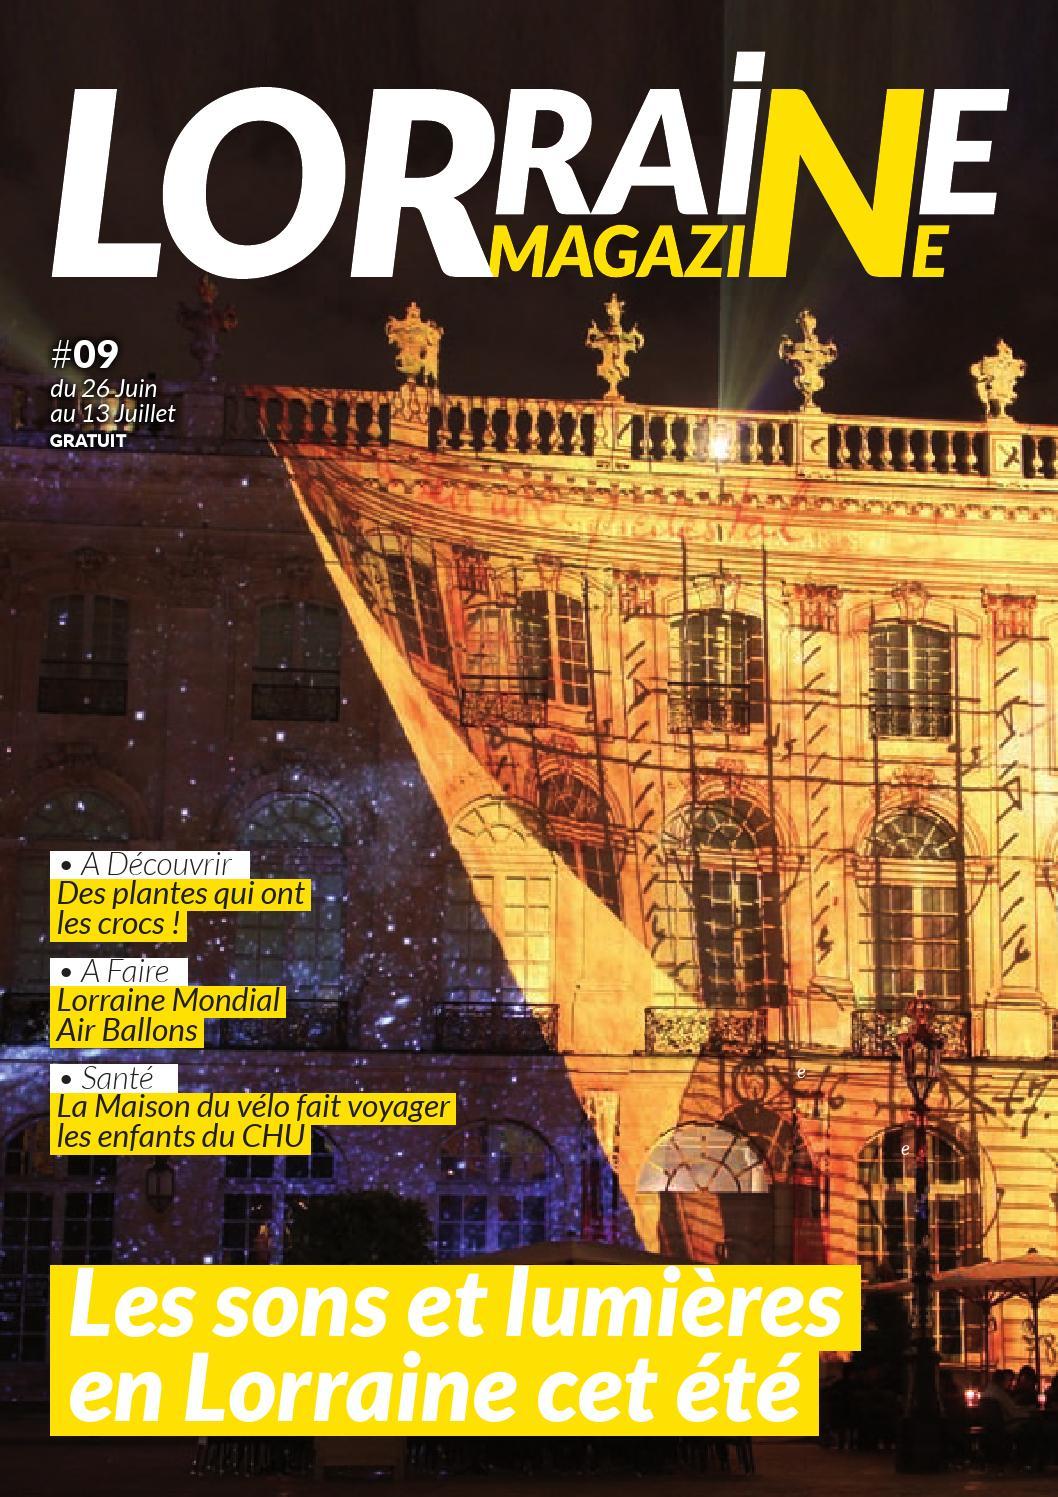 Lorraine Magazine #09 By Lorraine Magazine - Issuu tout Piscine Ecrouves